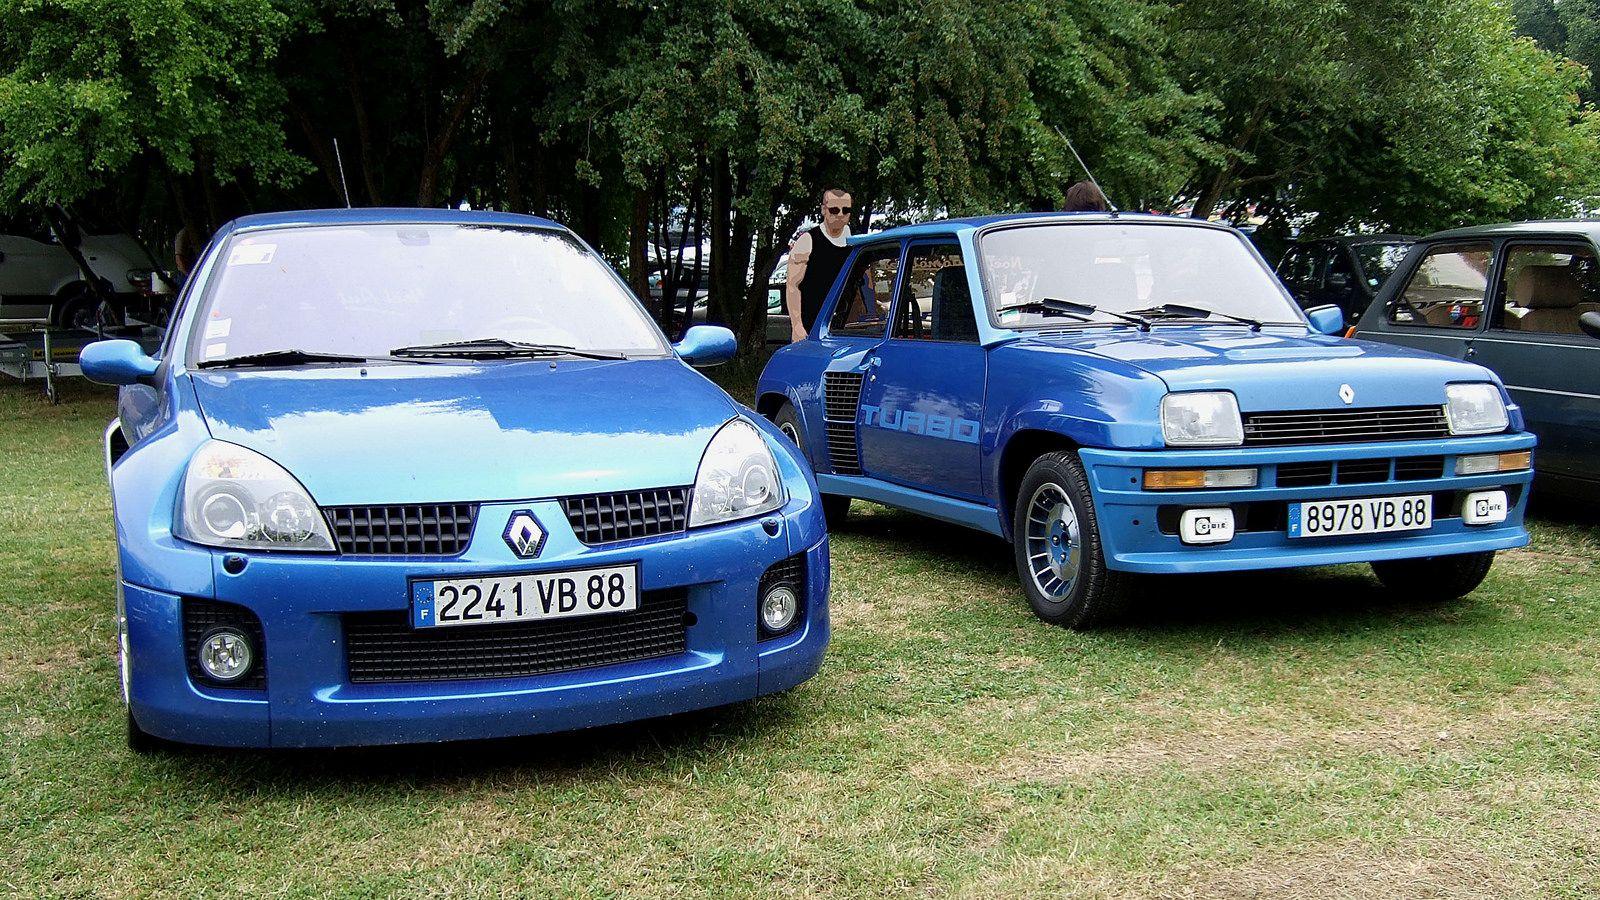 Renault Clio V6 Renault Sport (Phase 2 - 2003-05) & Renault